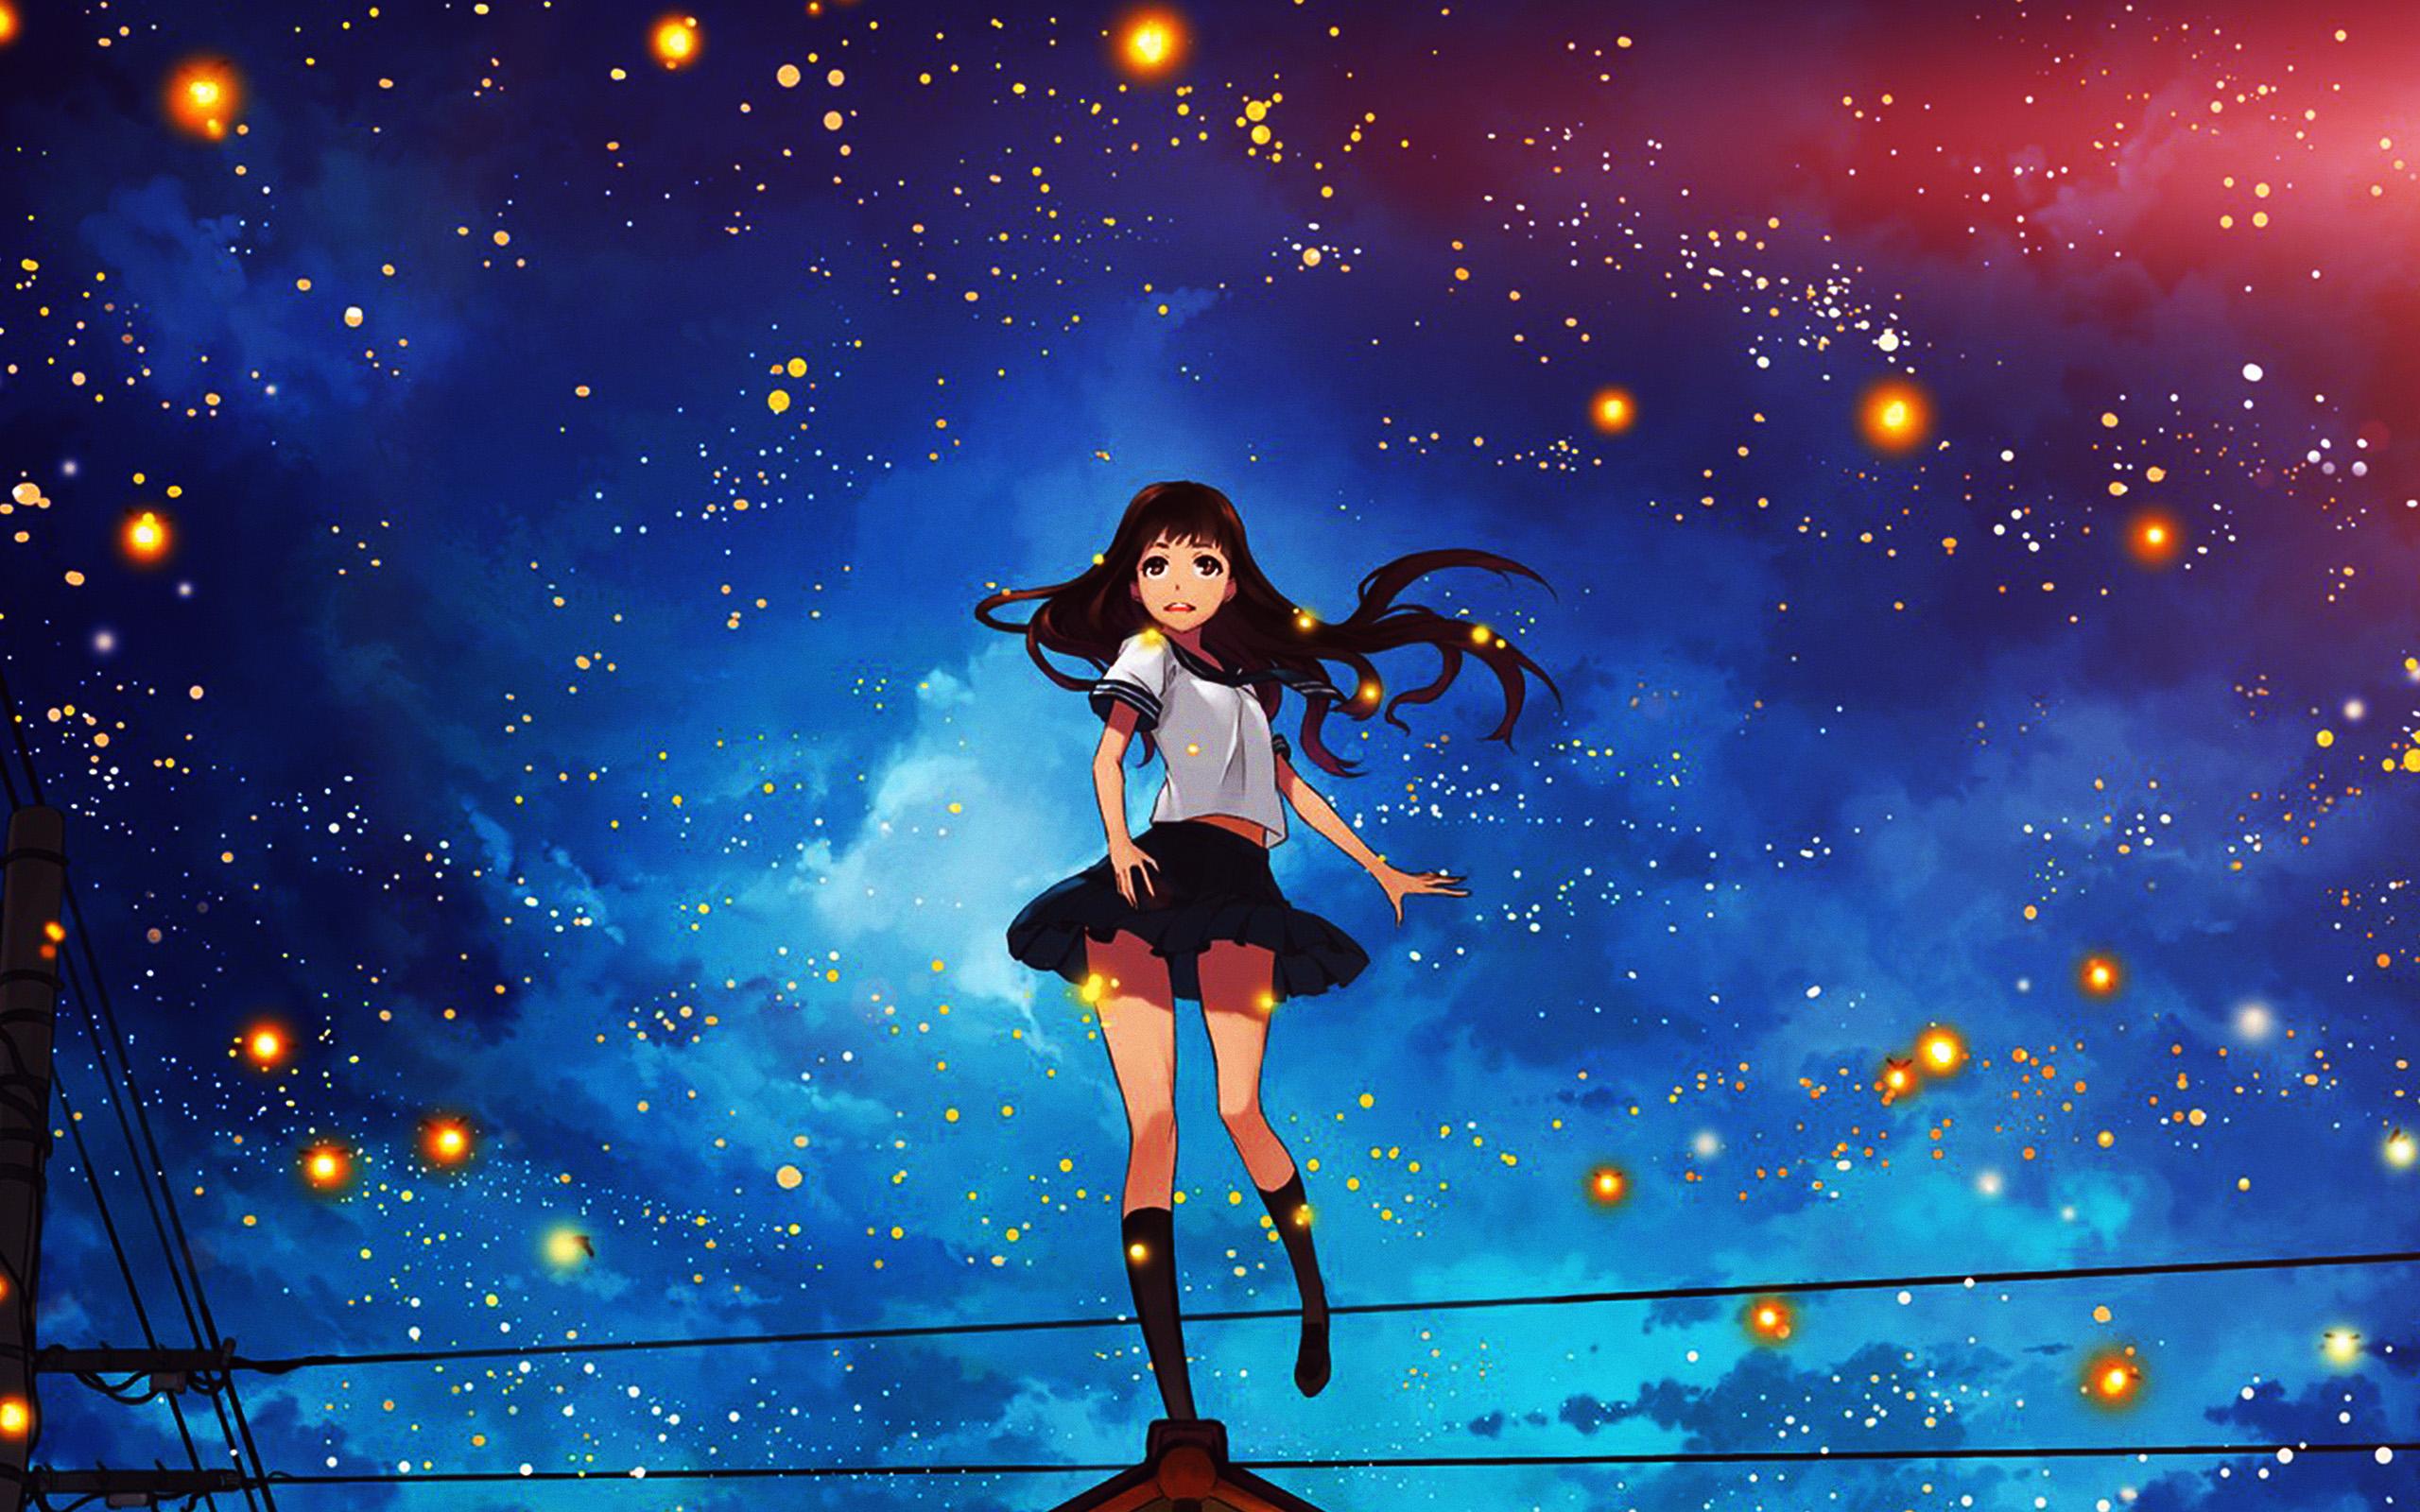 Pastel Cute Wallpaper 1080 Au47 Girl Anime Star Space Night Illustration Art Flare